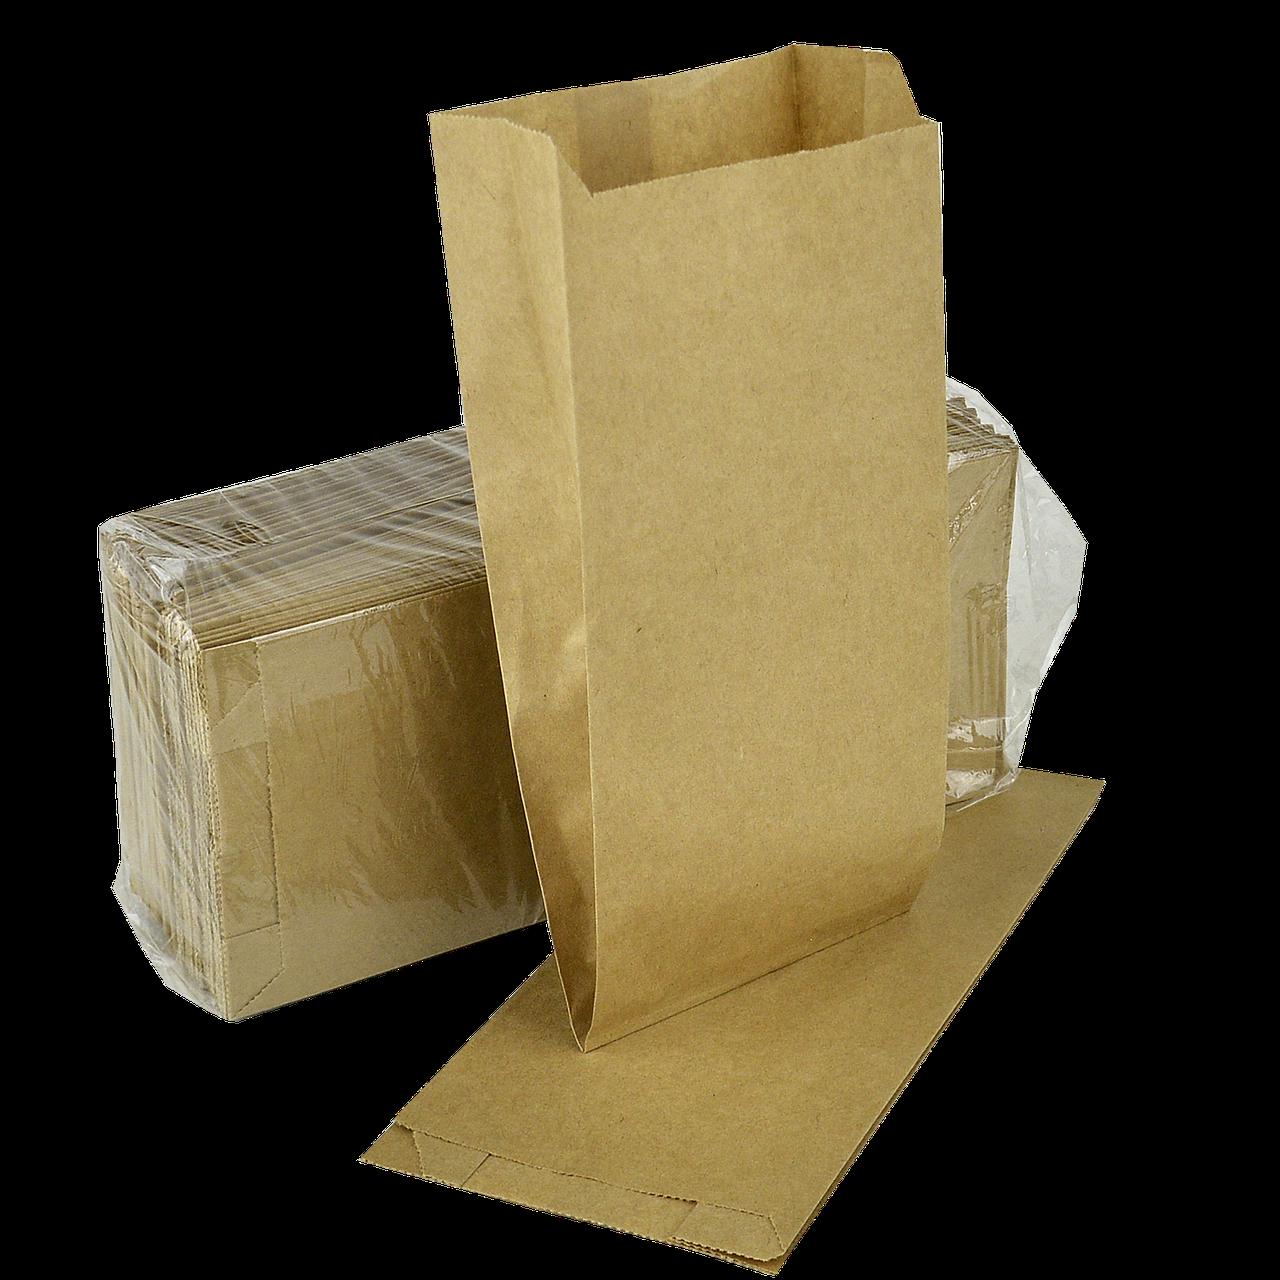 Пакет паперовий  220*100*50 100шт  Крафт (896)